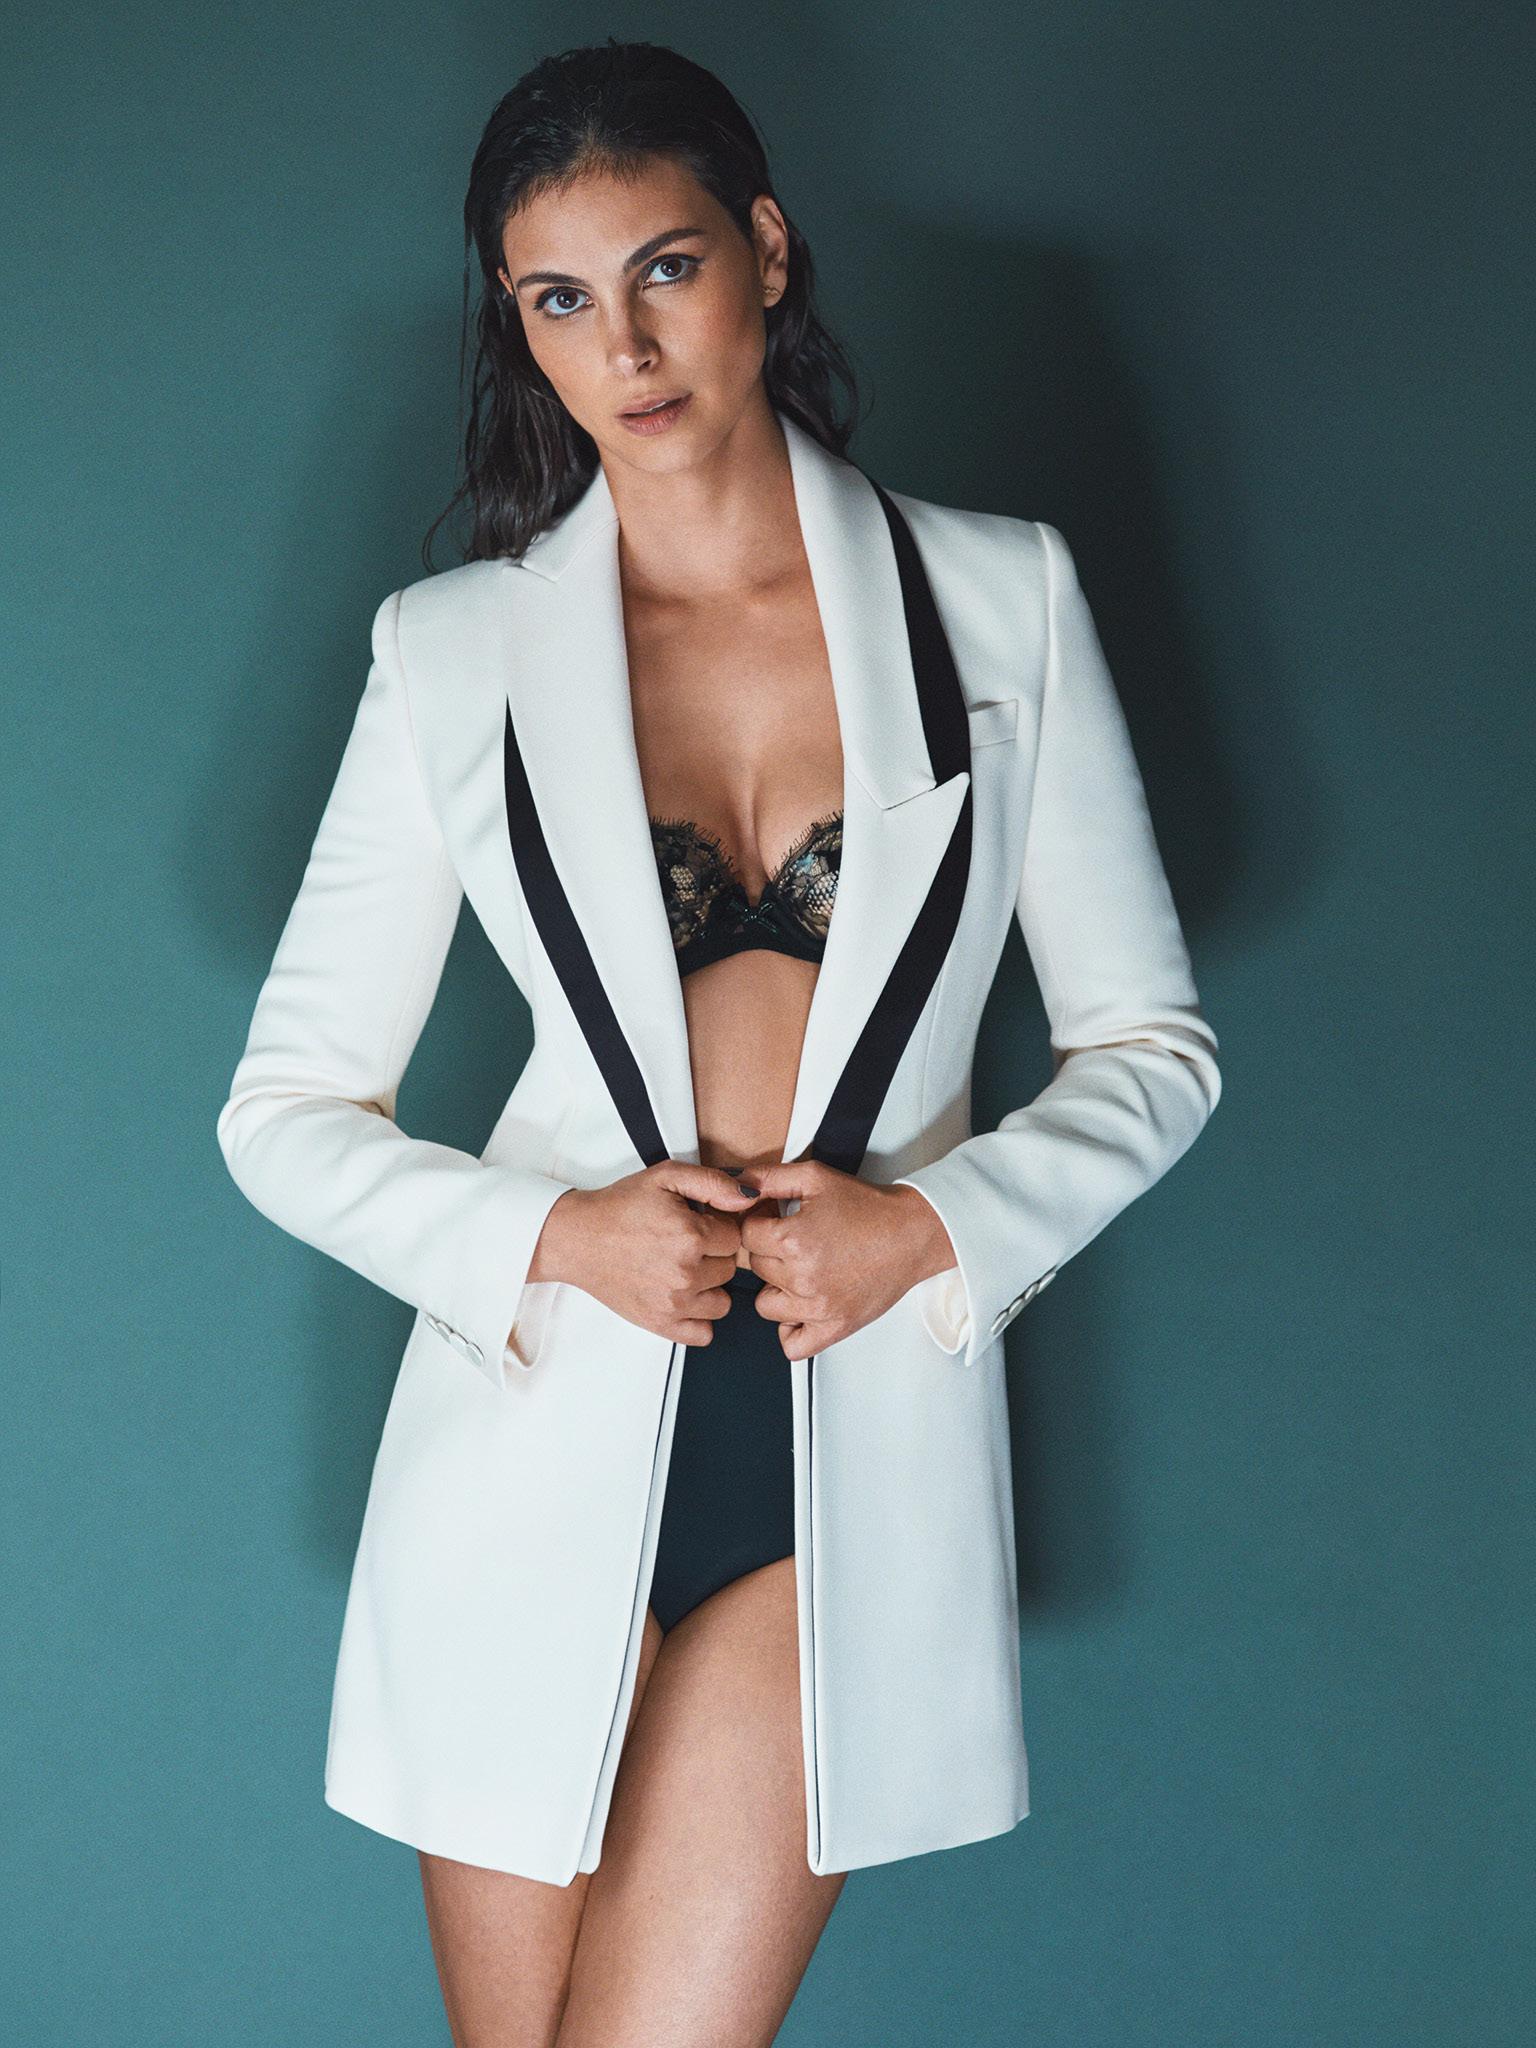 images Dani Thorne sideboob. 2018-2019 celebrityes photos leaks!